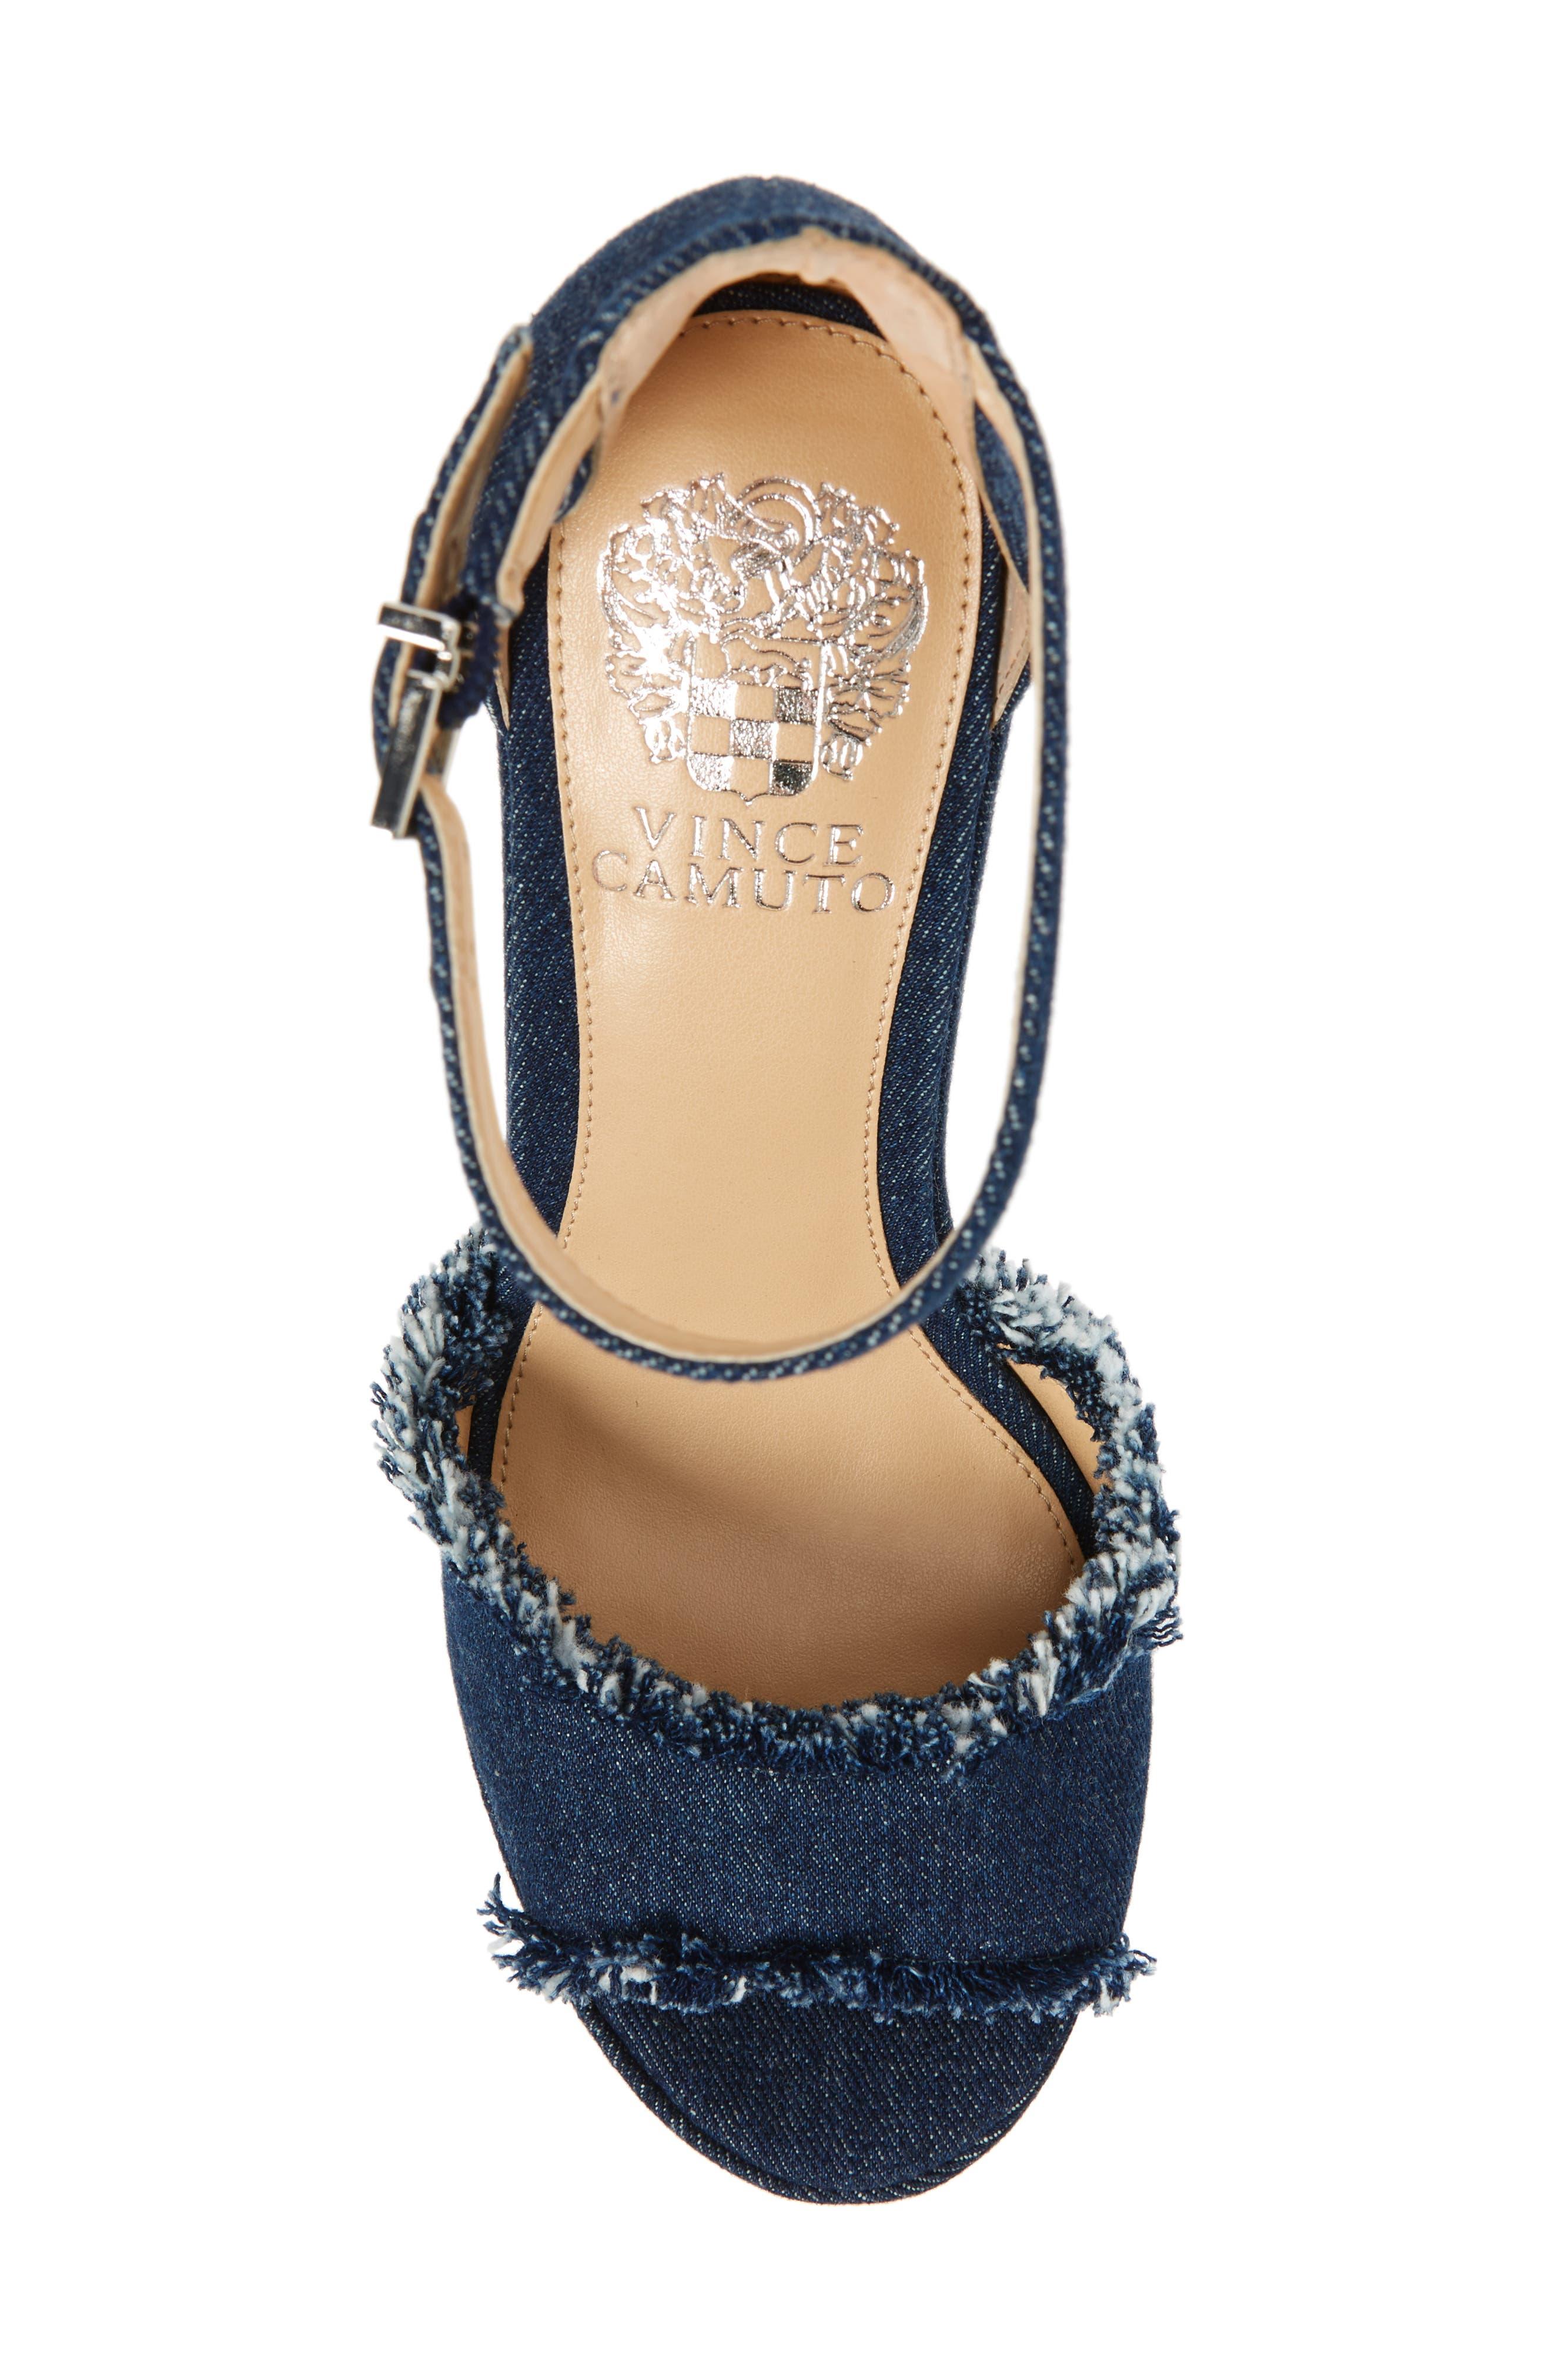 Tatchen Ankle Strap Platform Sandal,                             Alternate thumbnail 5, color,                             Dark Blue Denim